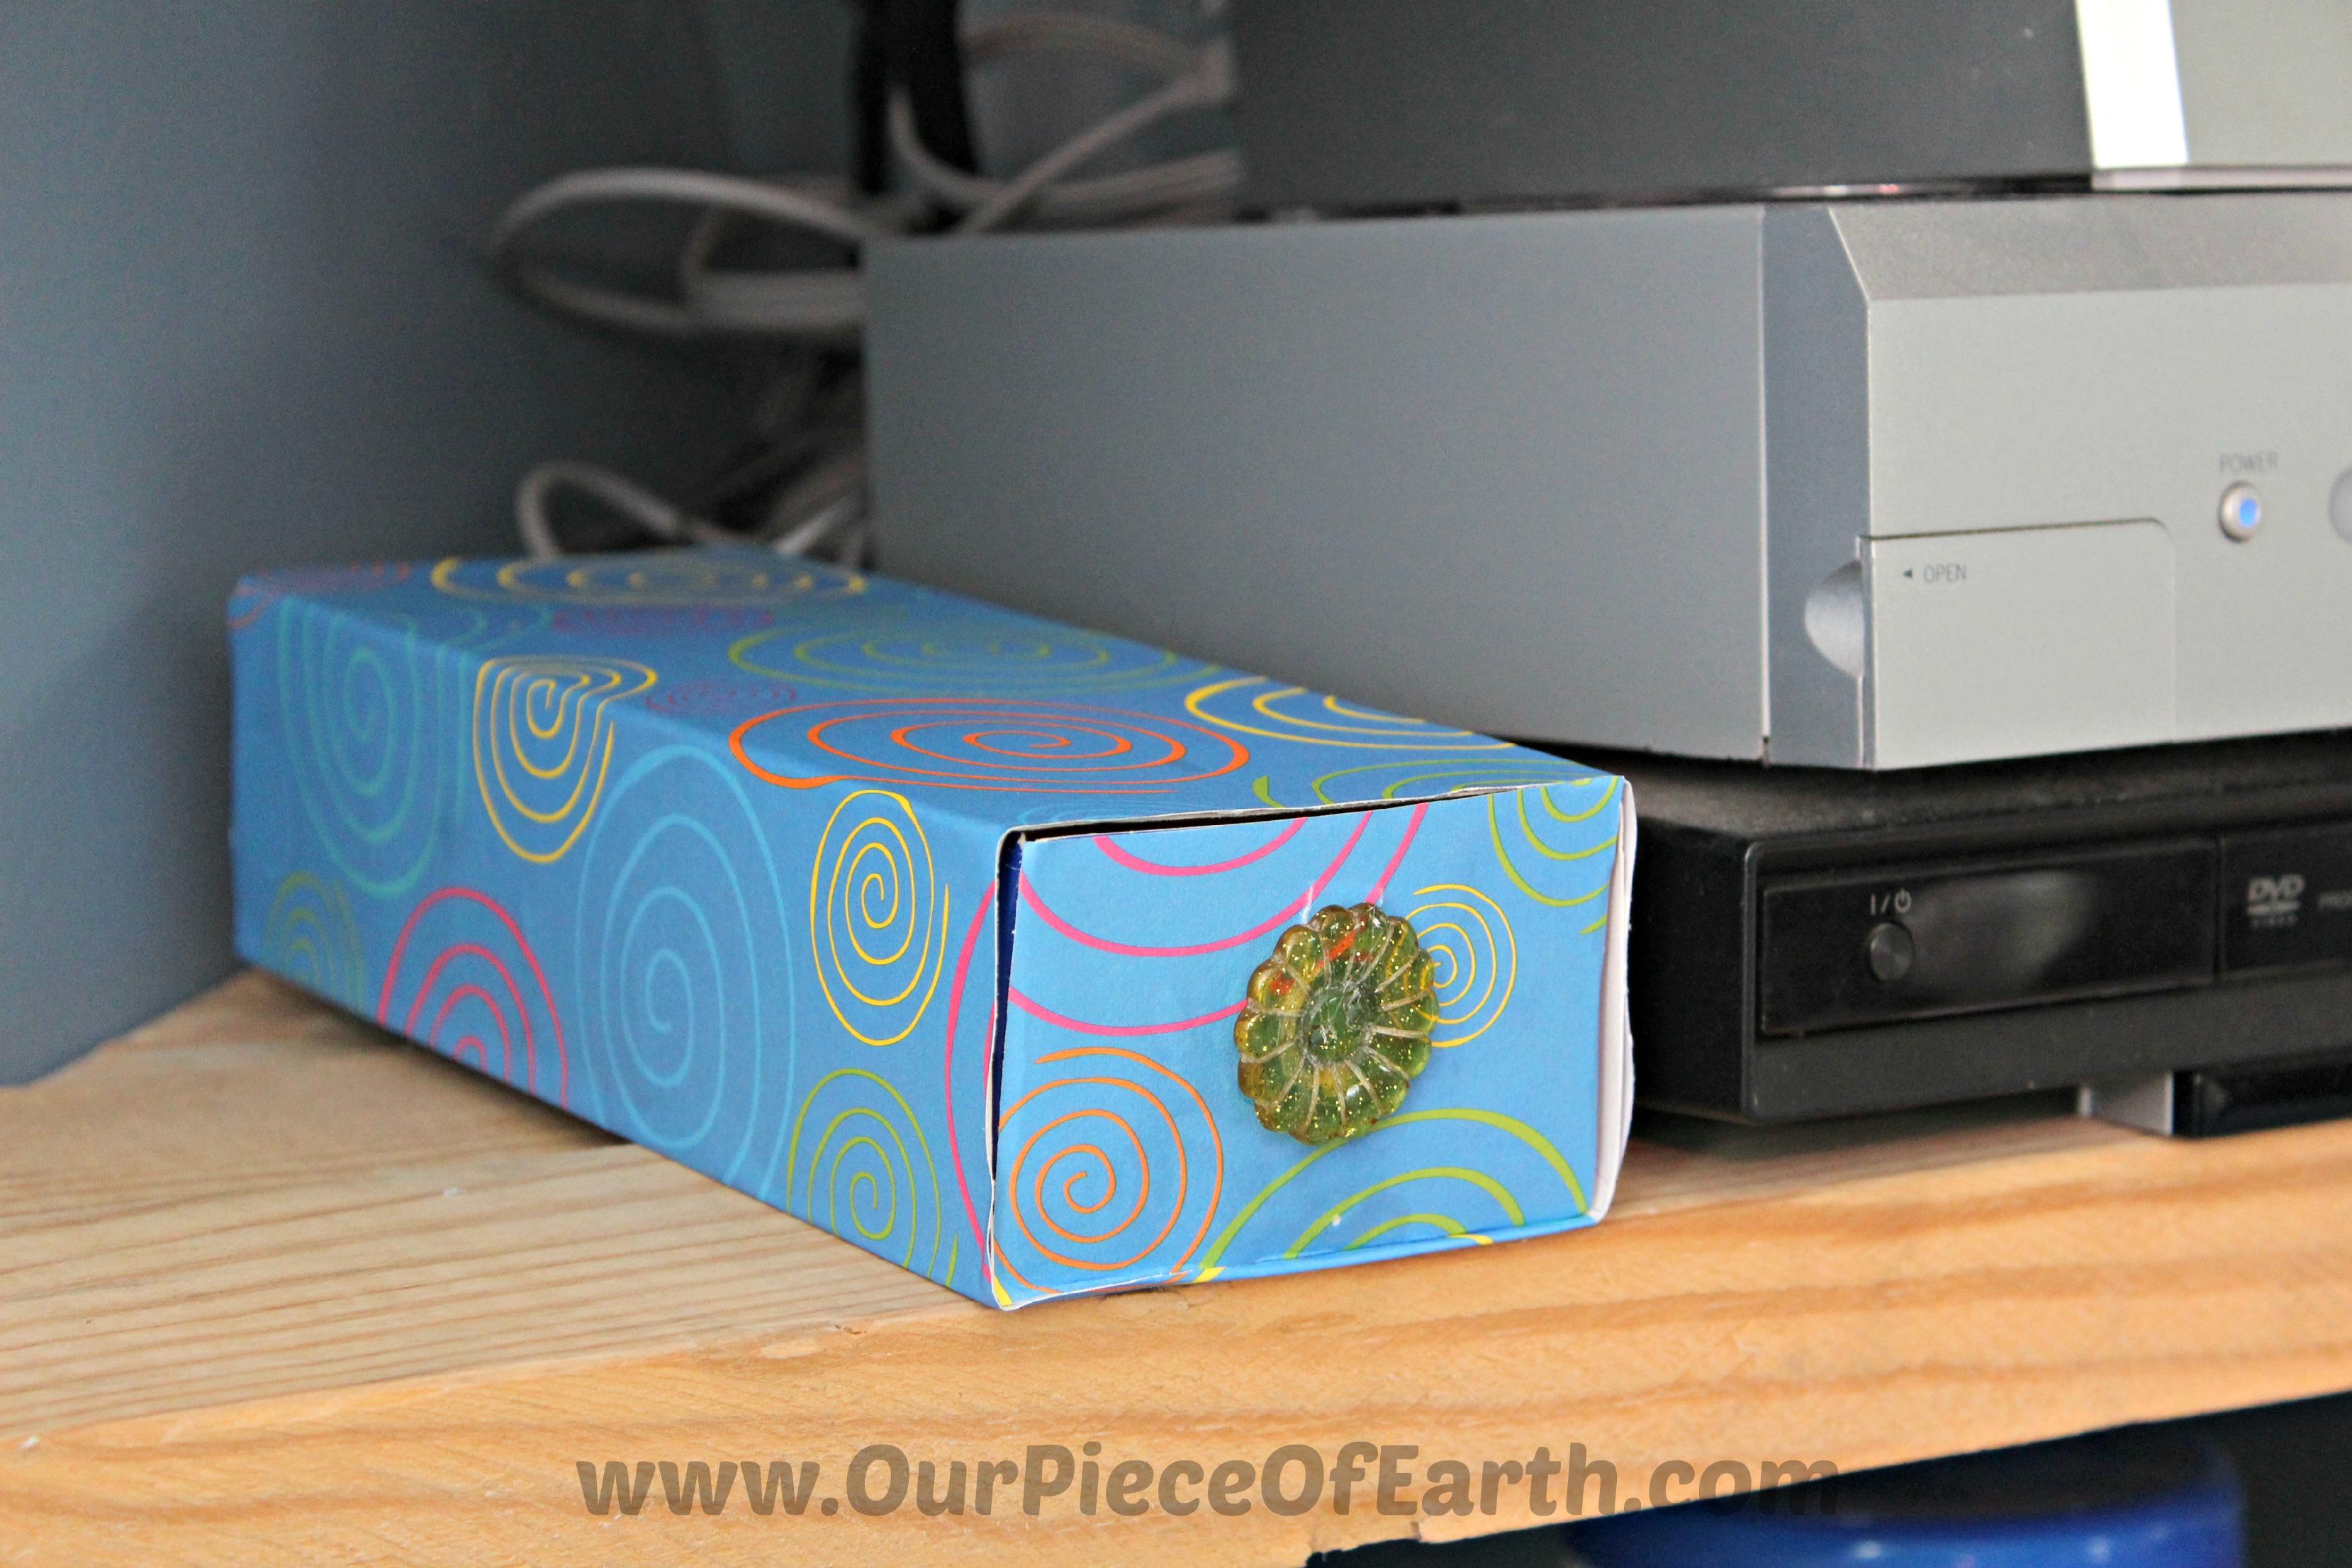 Battery box on shelf